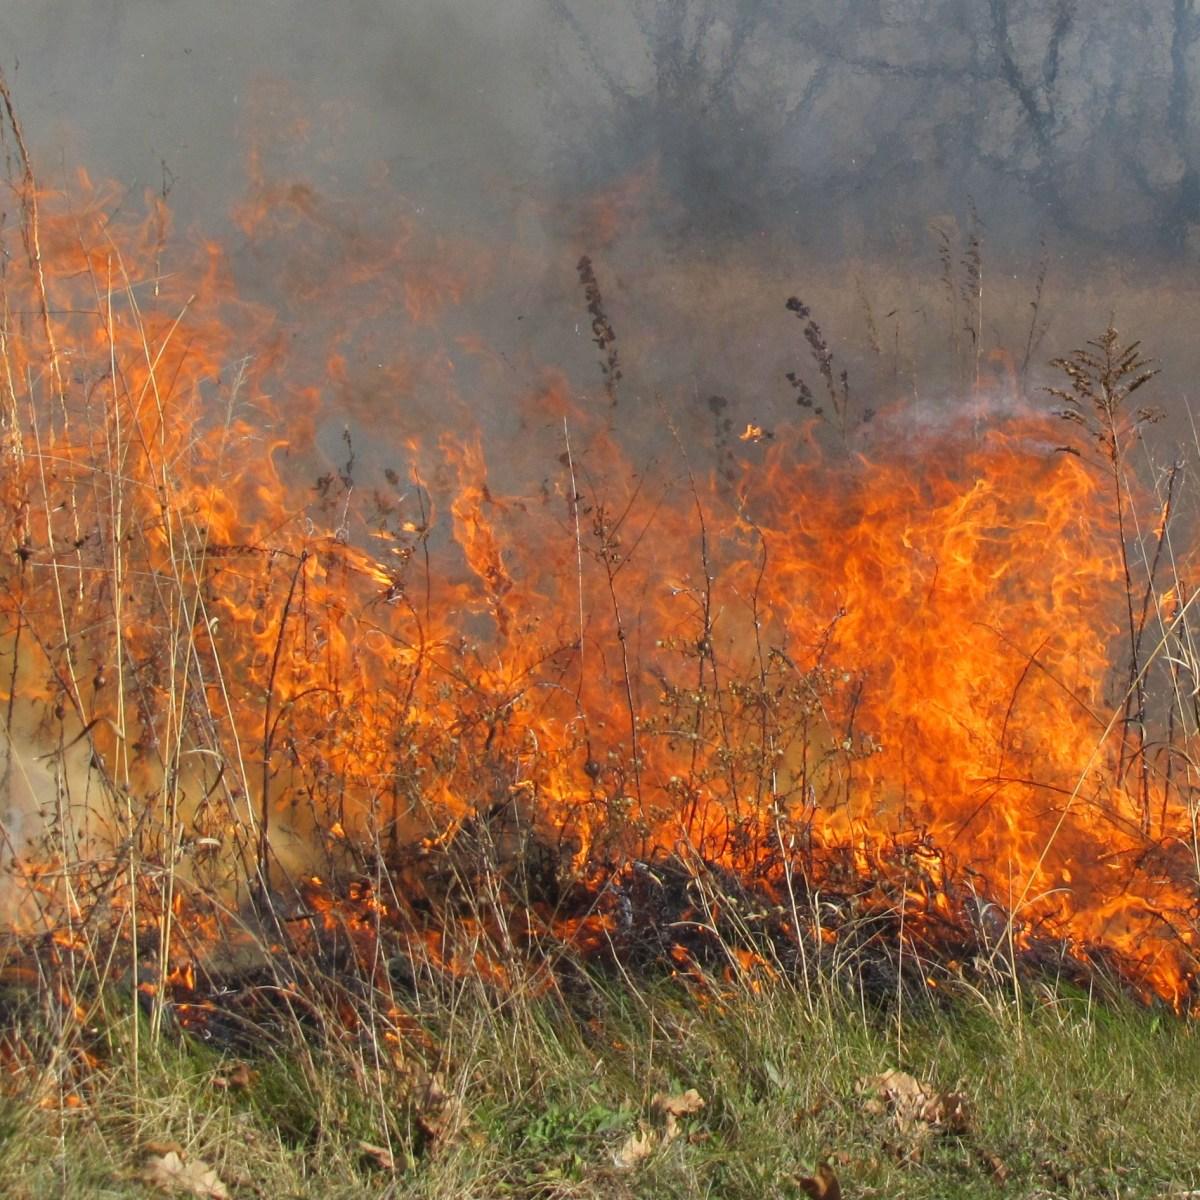 A prescribed fire burns in a meadow